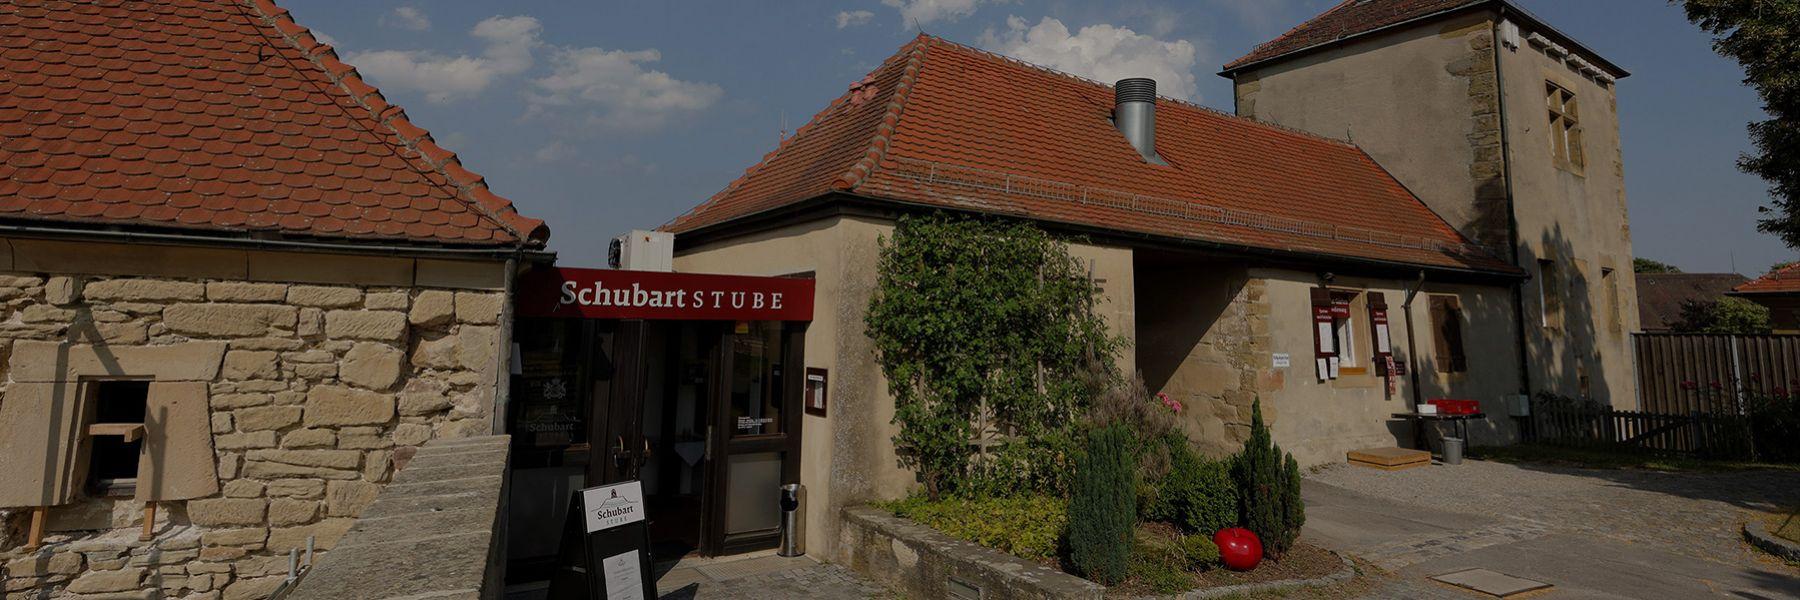 Schubart-Stube